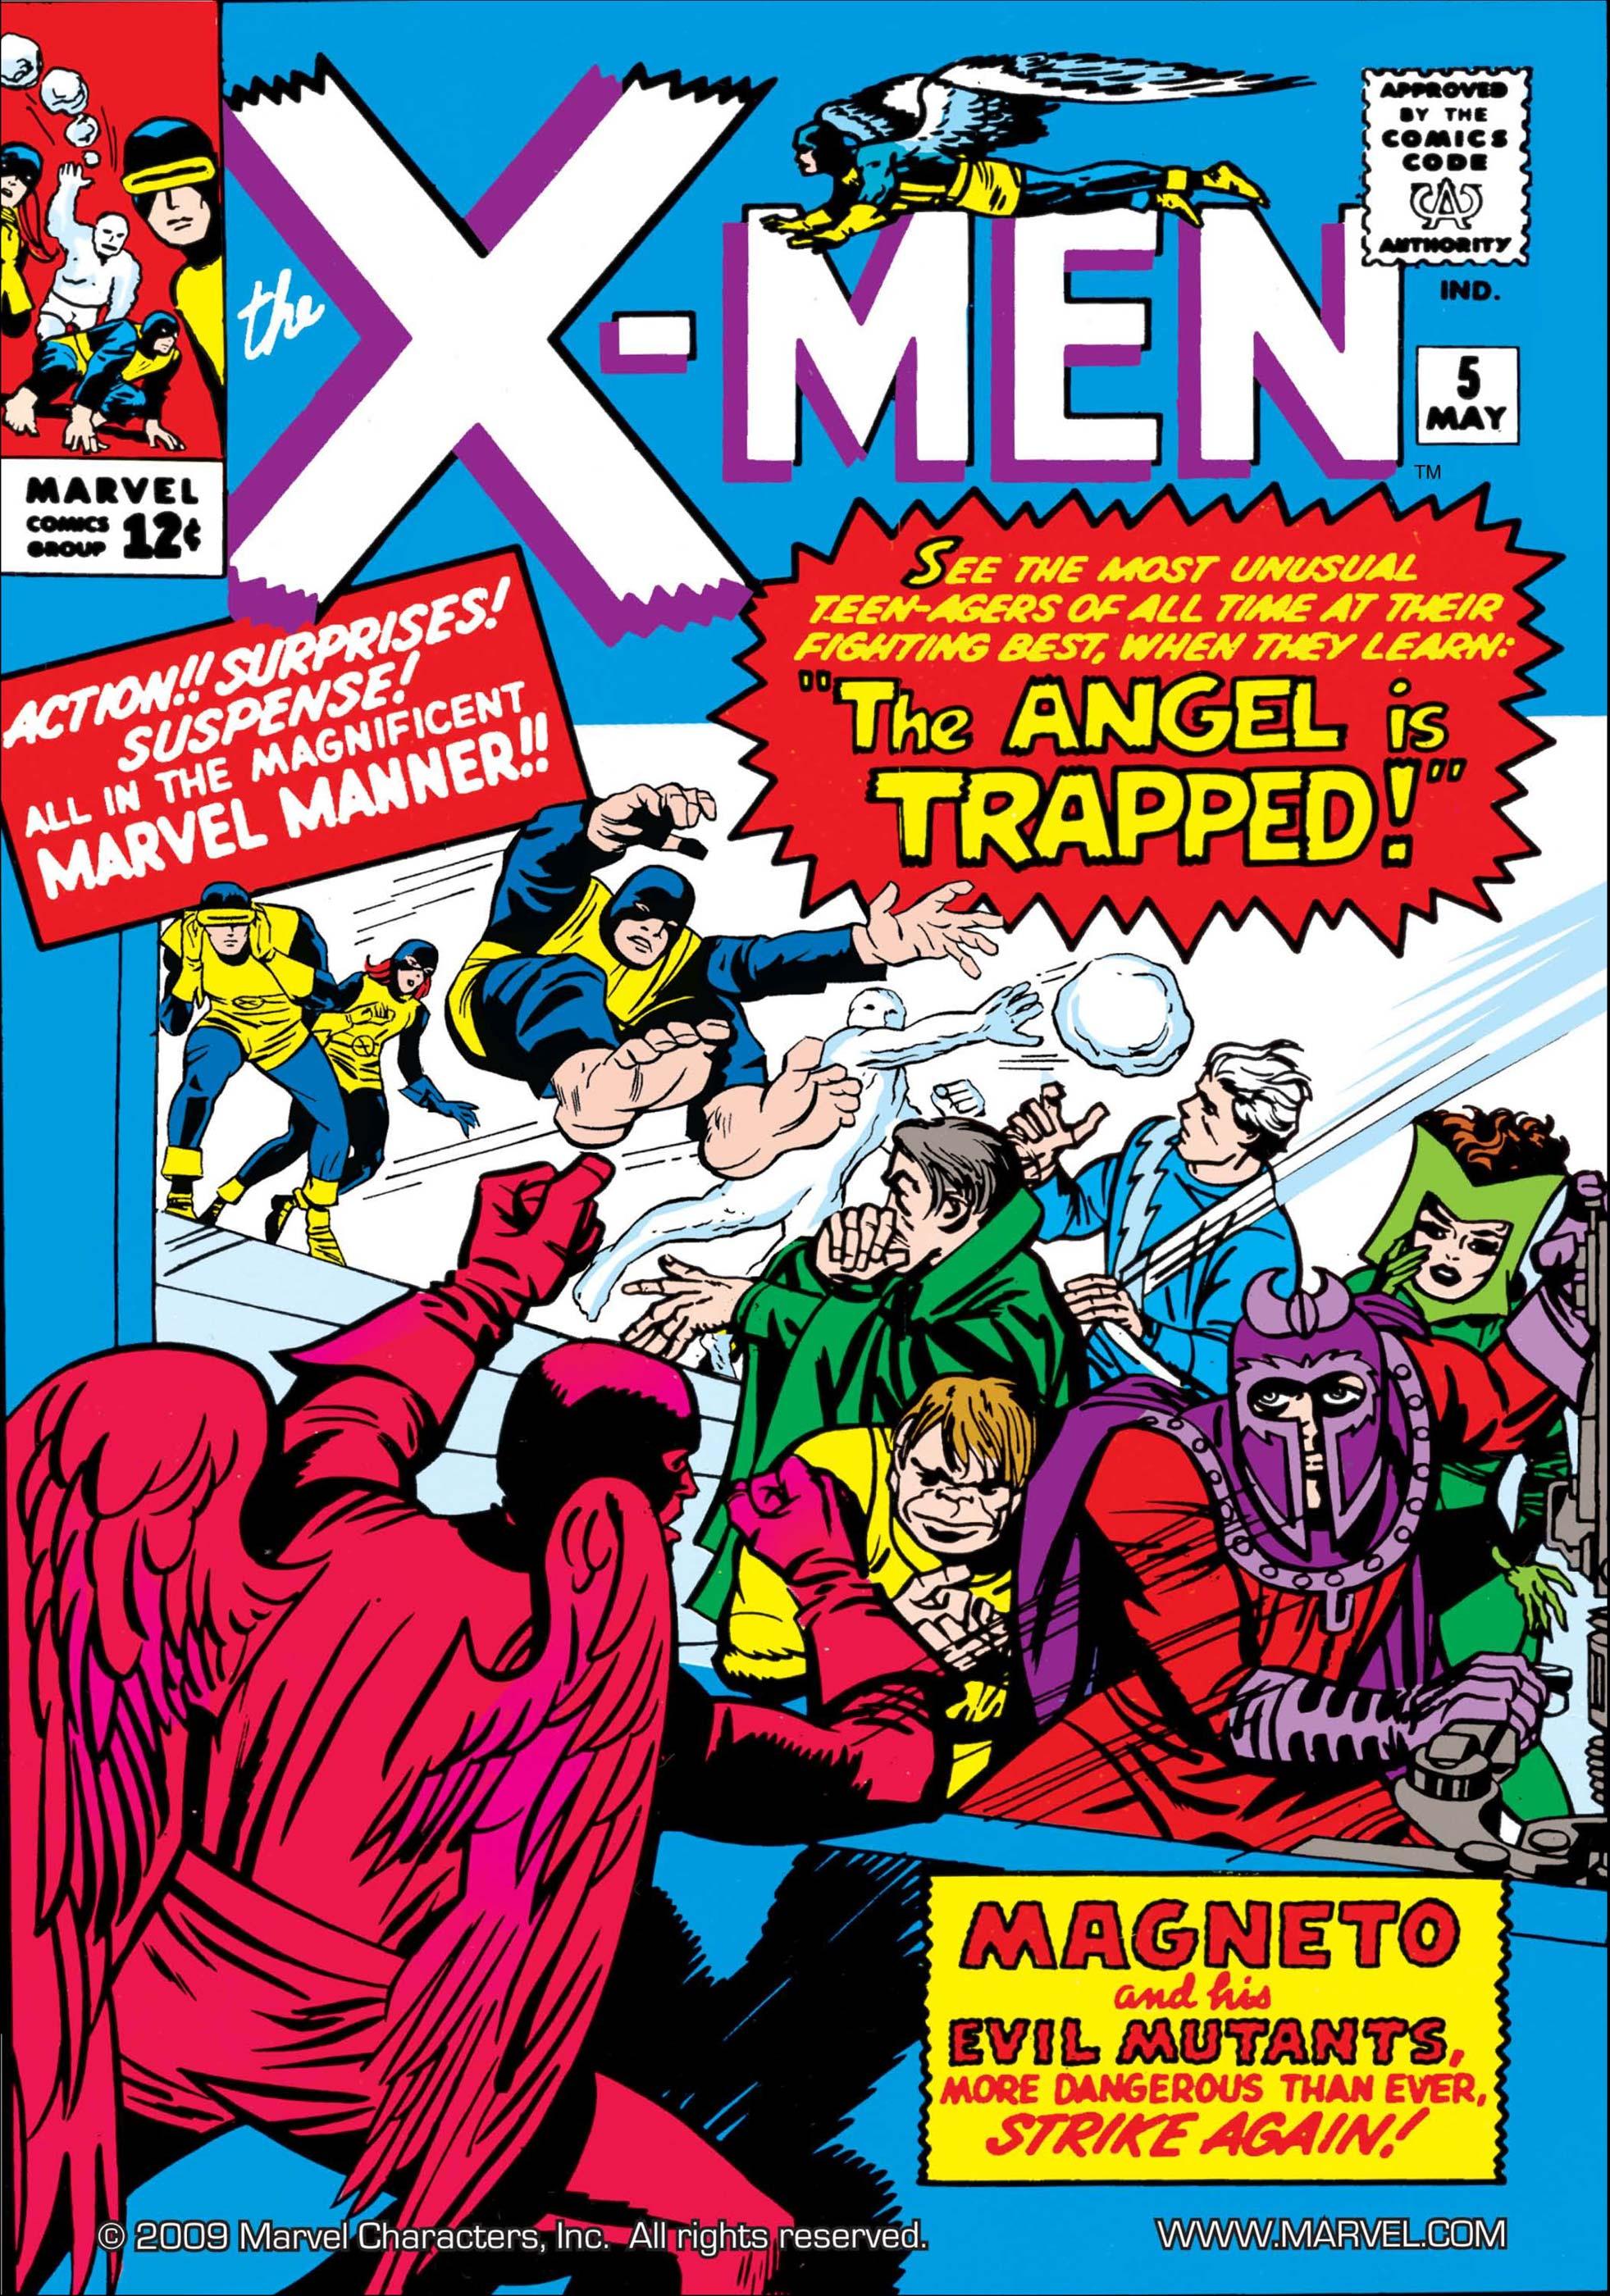 Uncanny X-Men (1963) #5